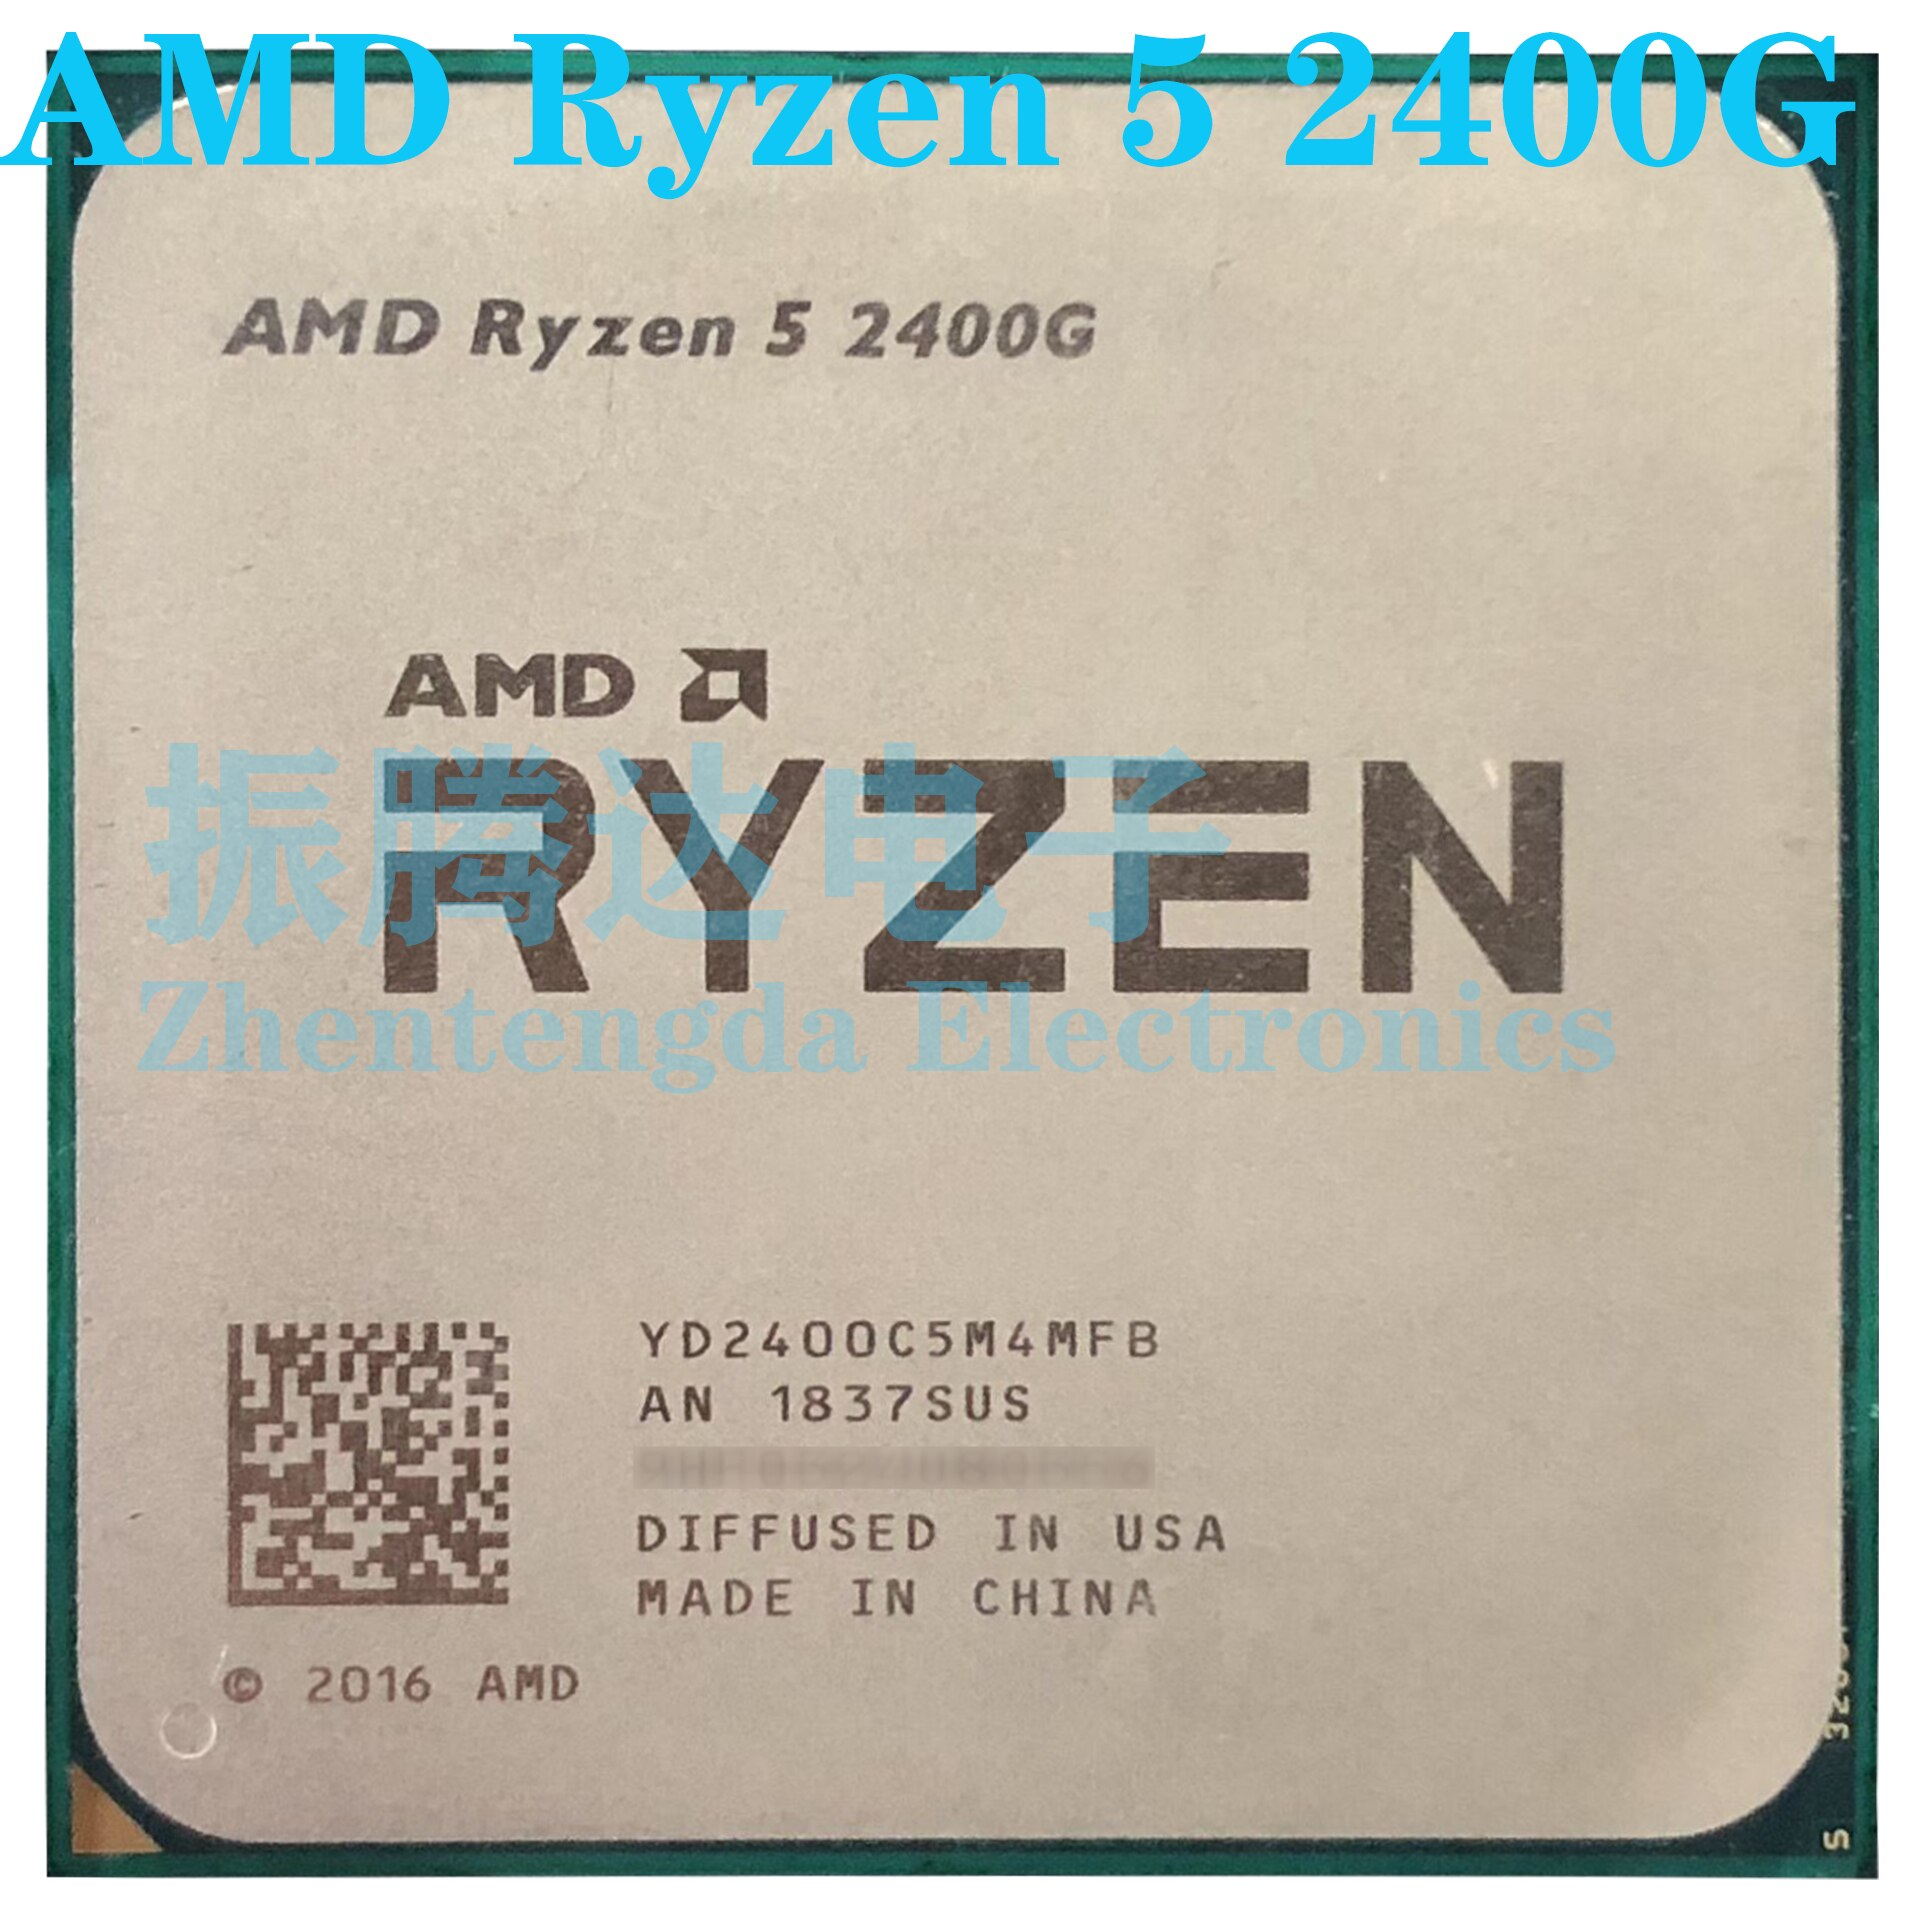 AMD Ryzen 5 2400G CPU 3.6GHz 4MB 4 Core 8 Thread Socket AM4 R5-2400G CPU Processor